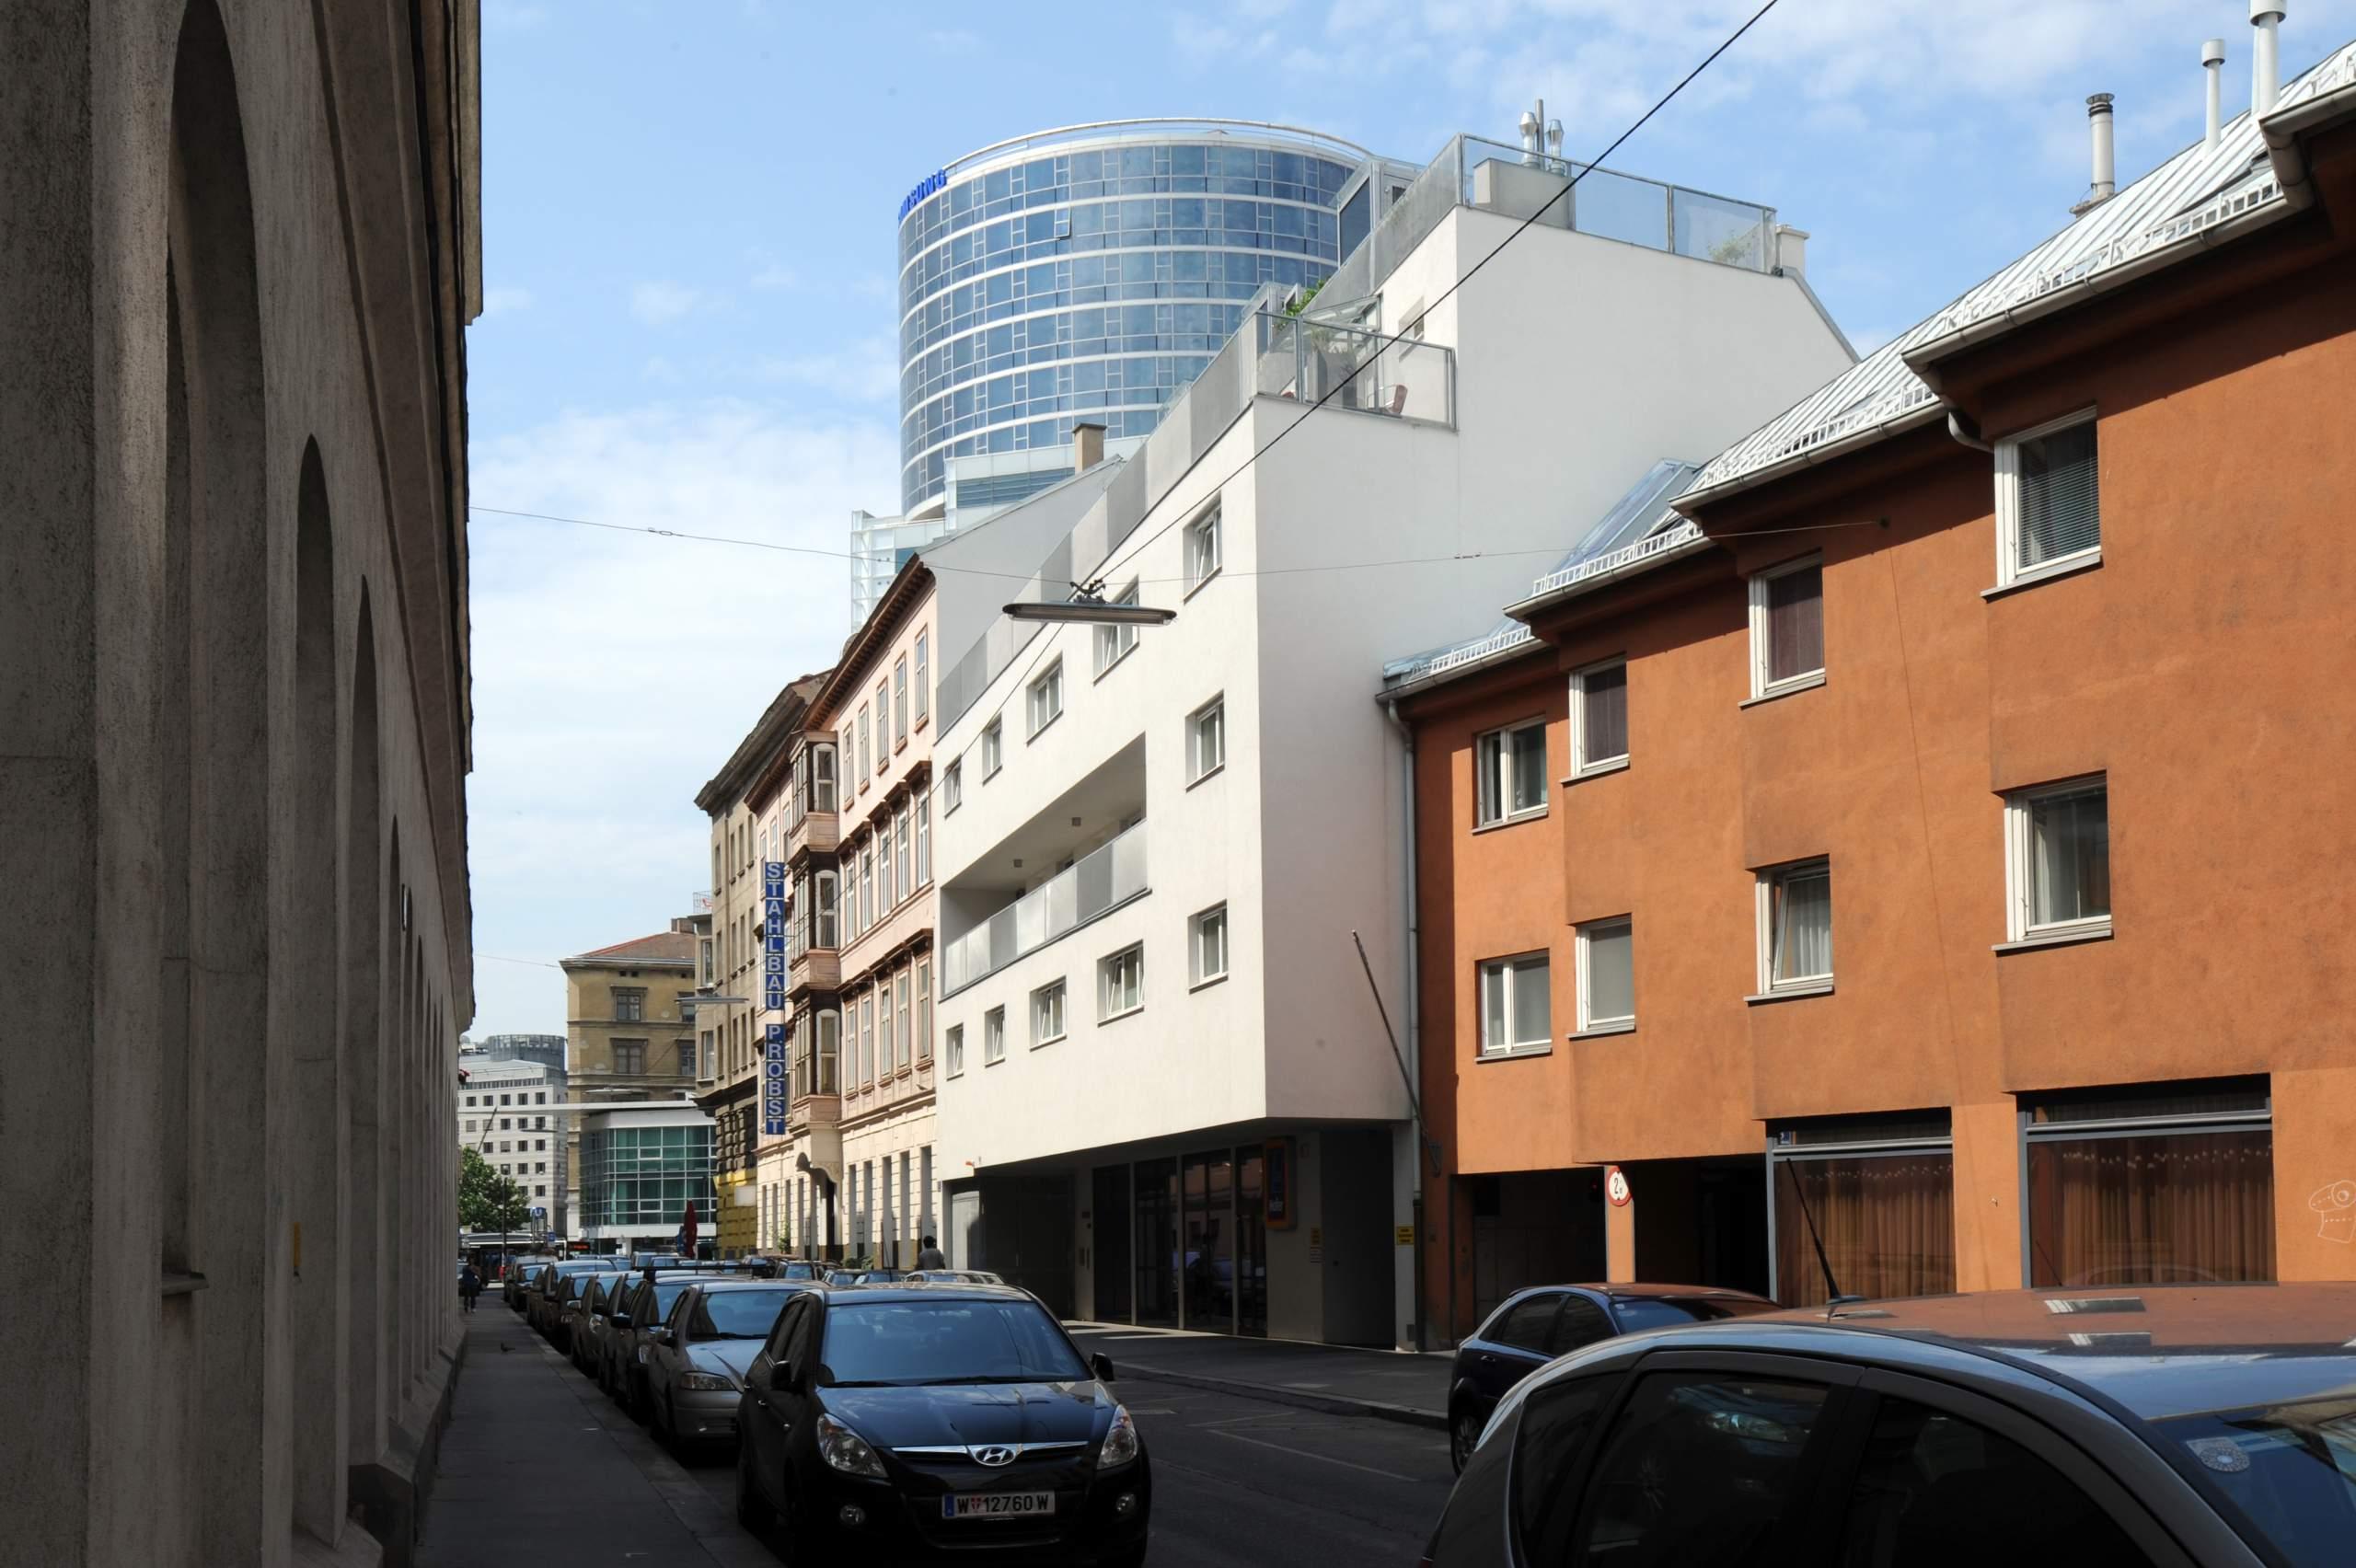 LIEGLER TAKEH ARCHITEKTEN Projekt Zirkusgasse Fassade Weintraubengasse